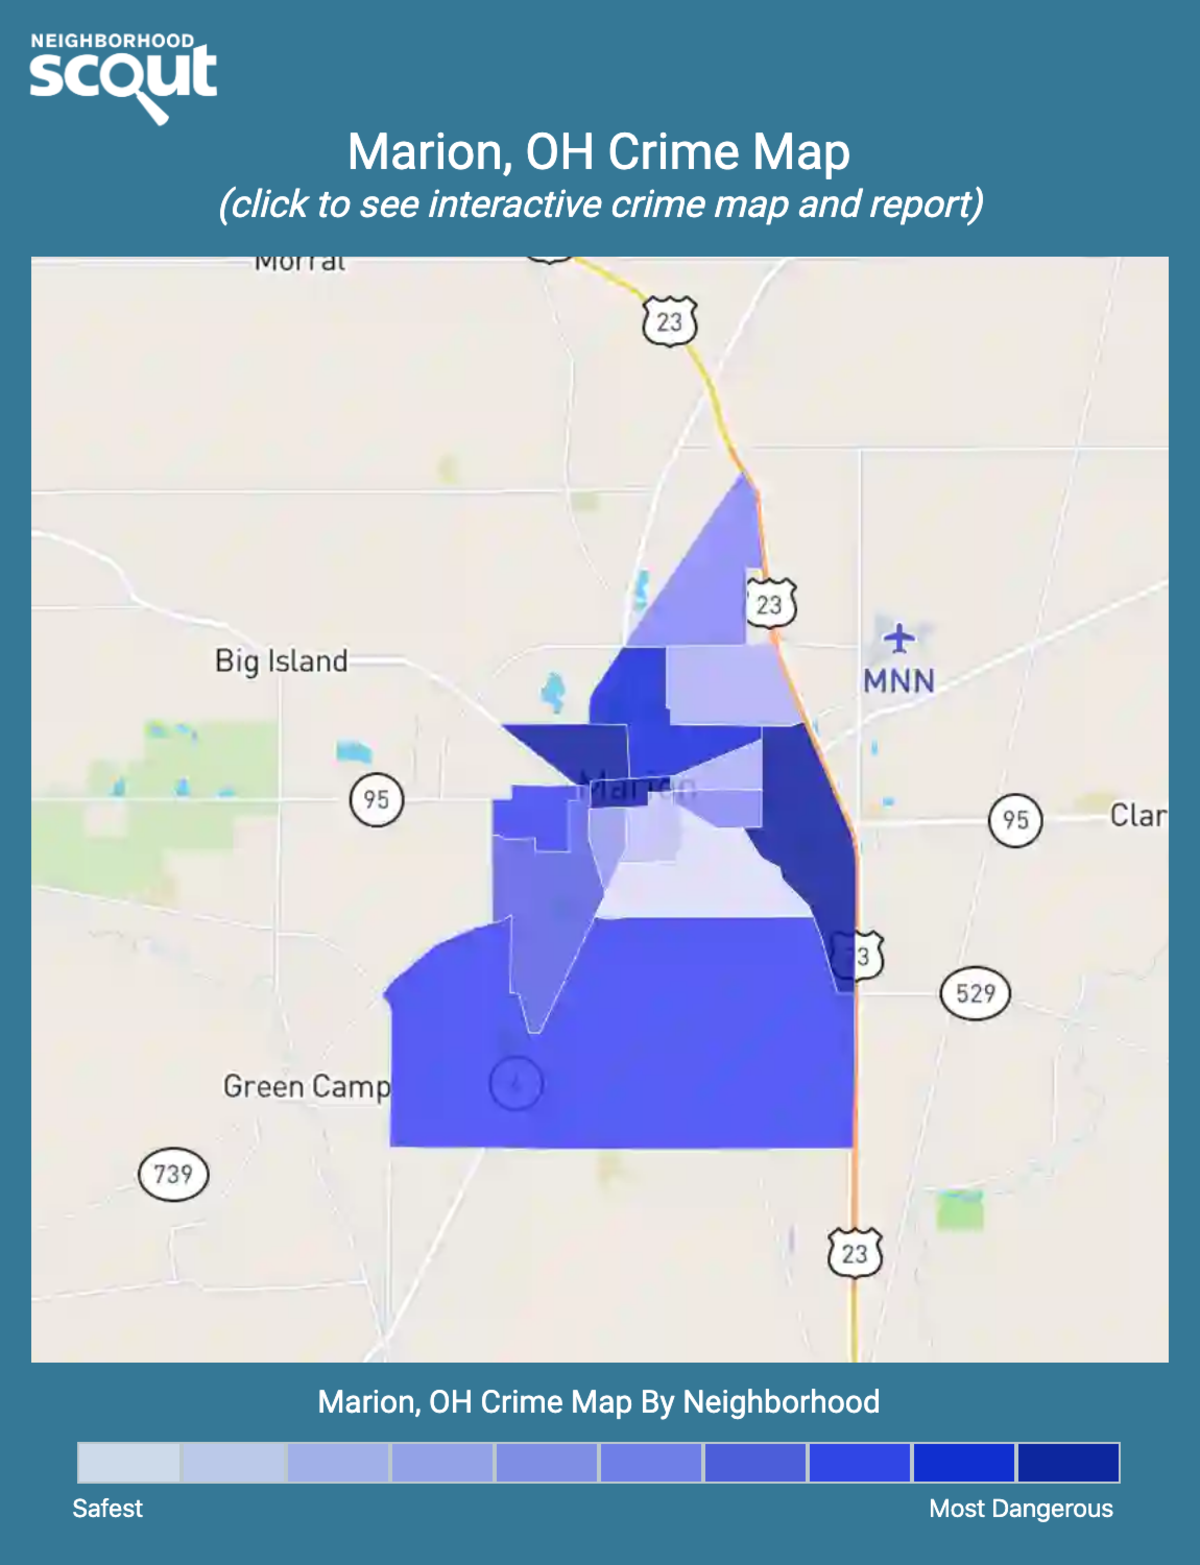 Marion, Ohio crime map